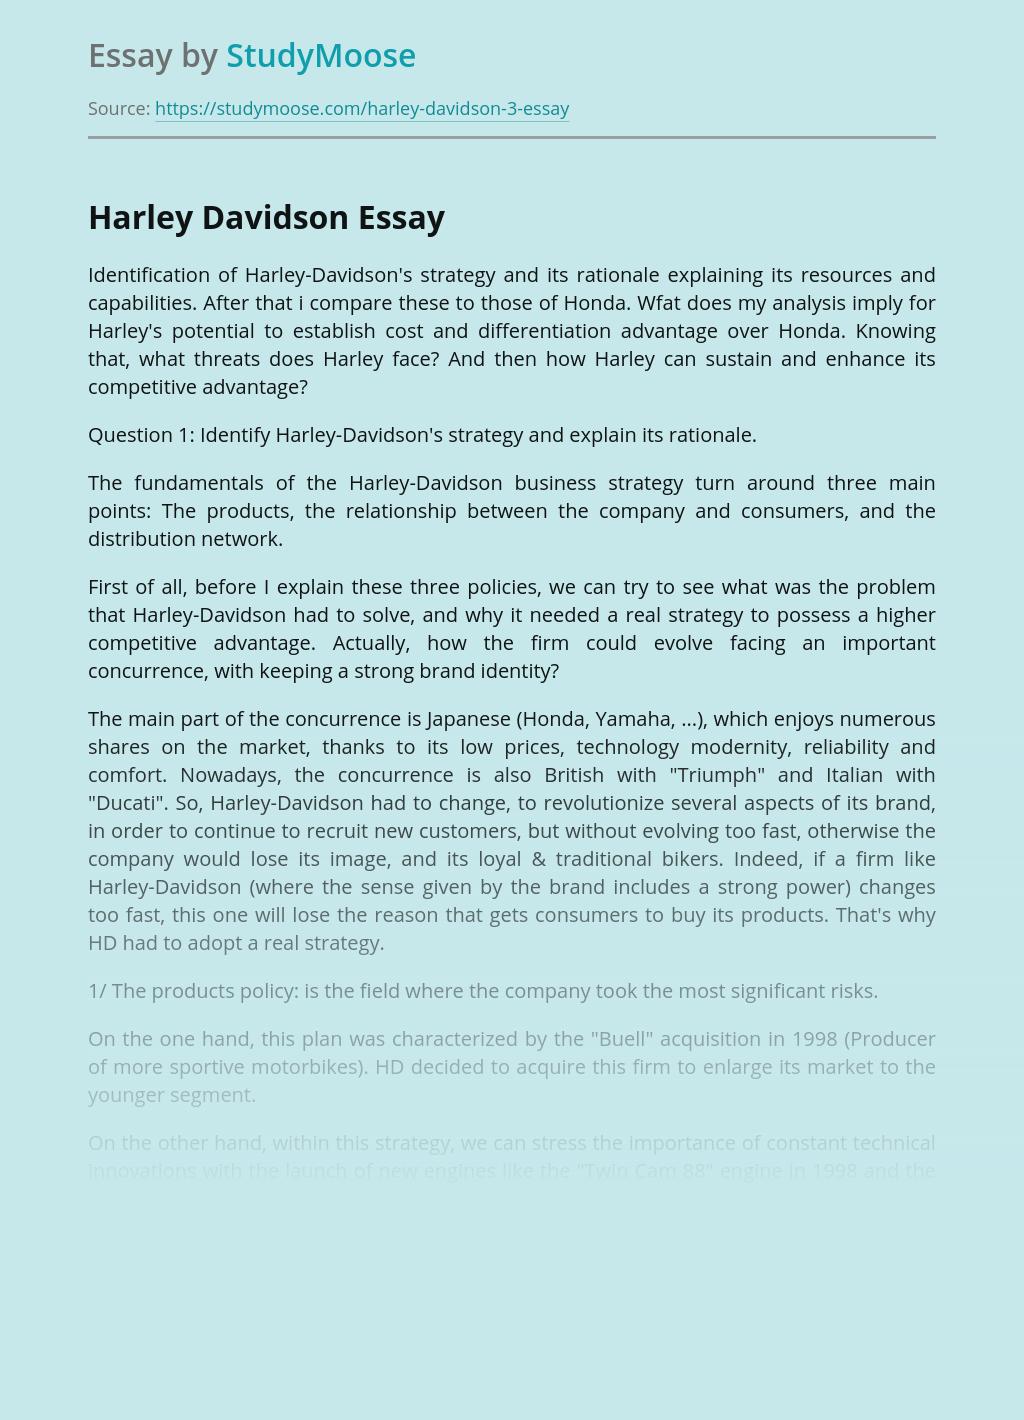 Analysis of Harley Davidson vs Honda Business Strategy